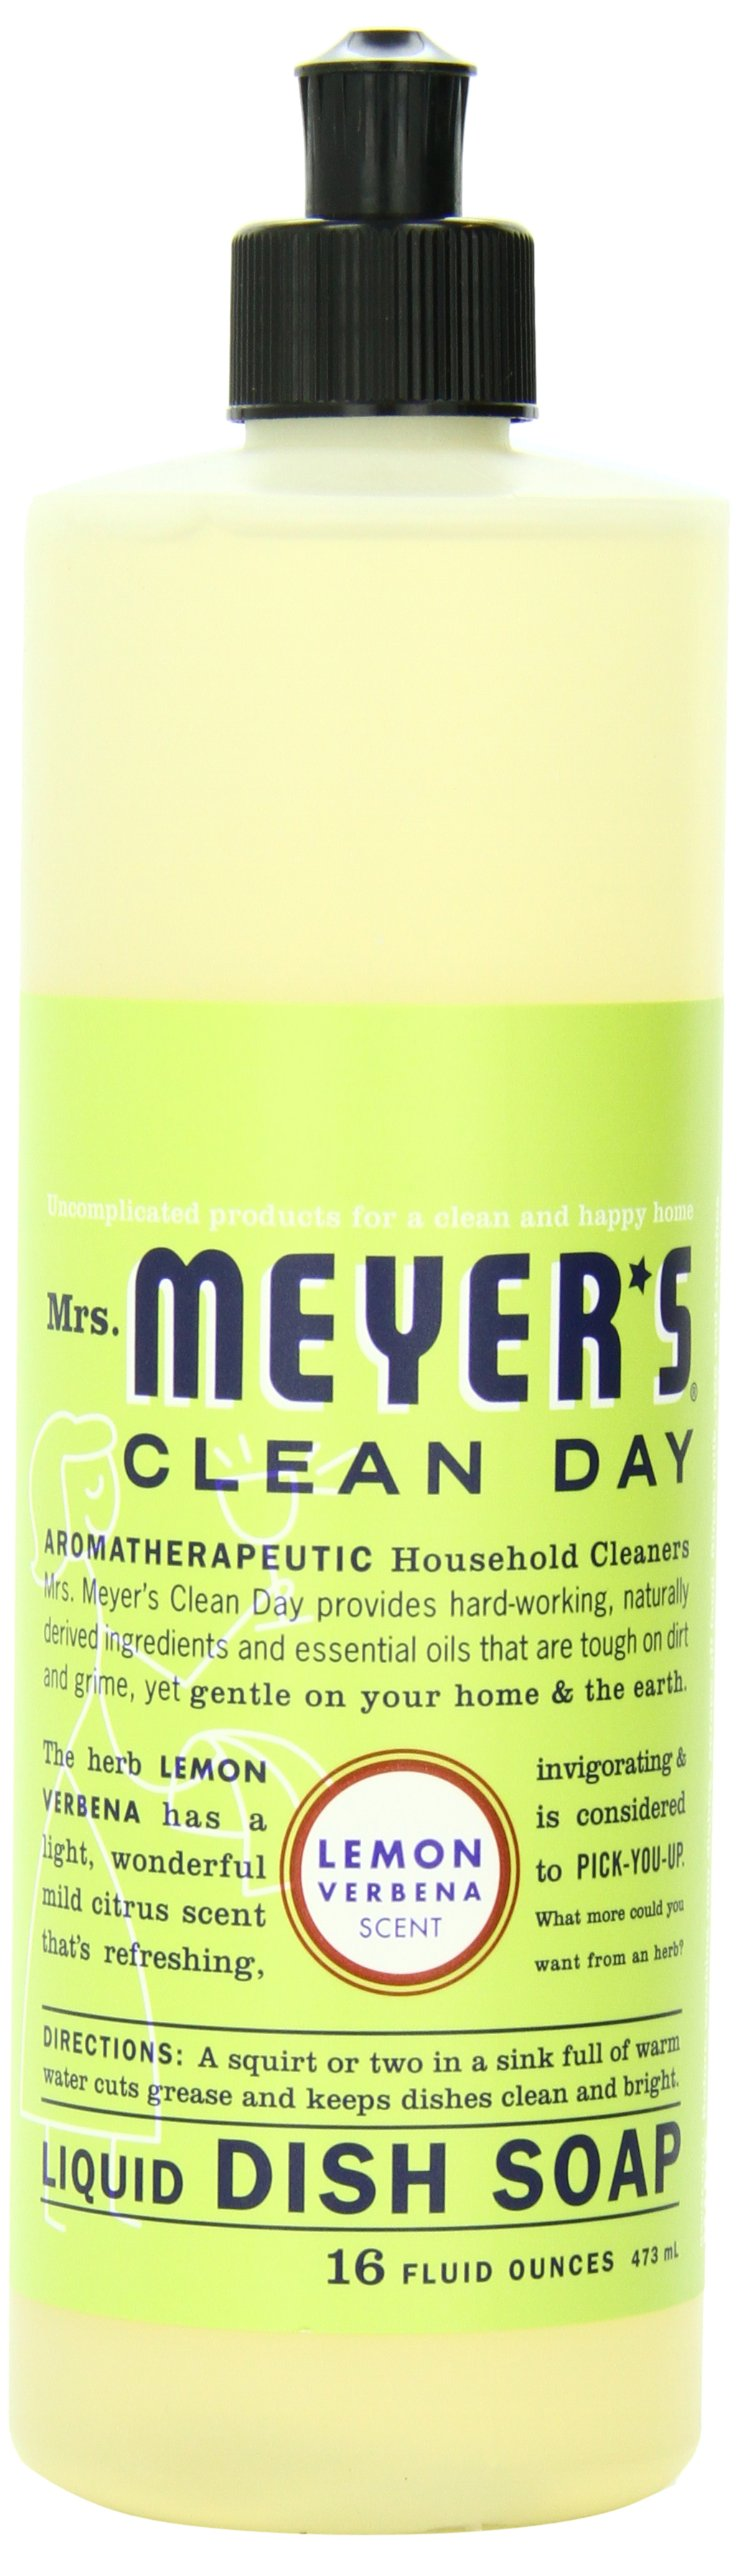 Mrs. Meyer's Clean Day Dish Soap, Lemon Verbena, 16-Ounce Bottles (Case of 6)